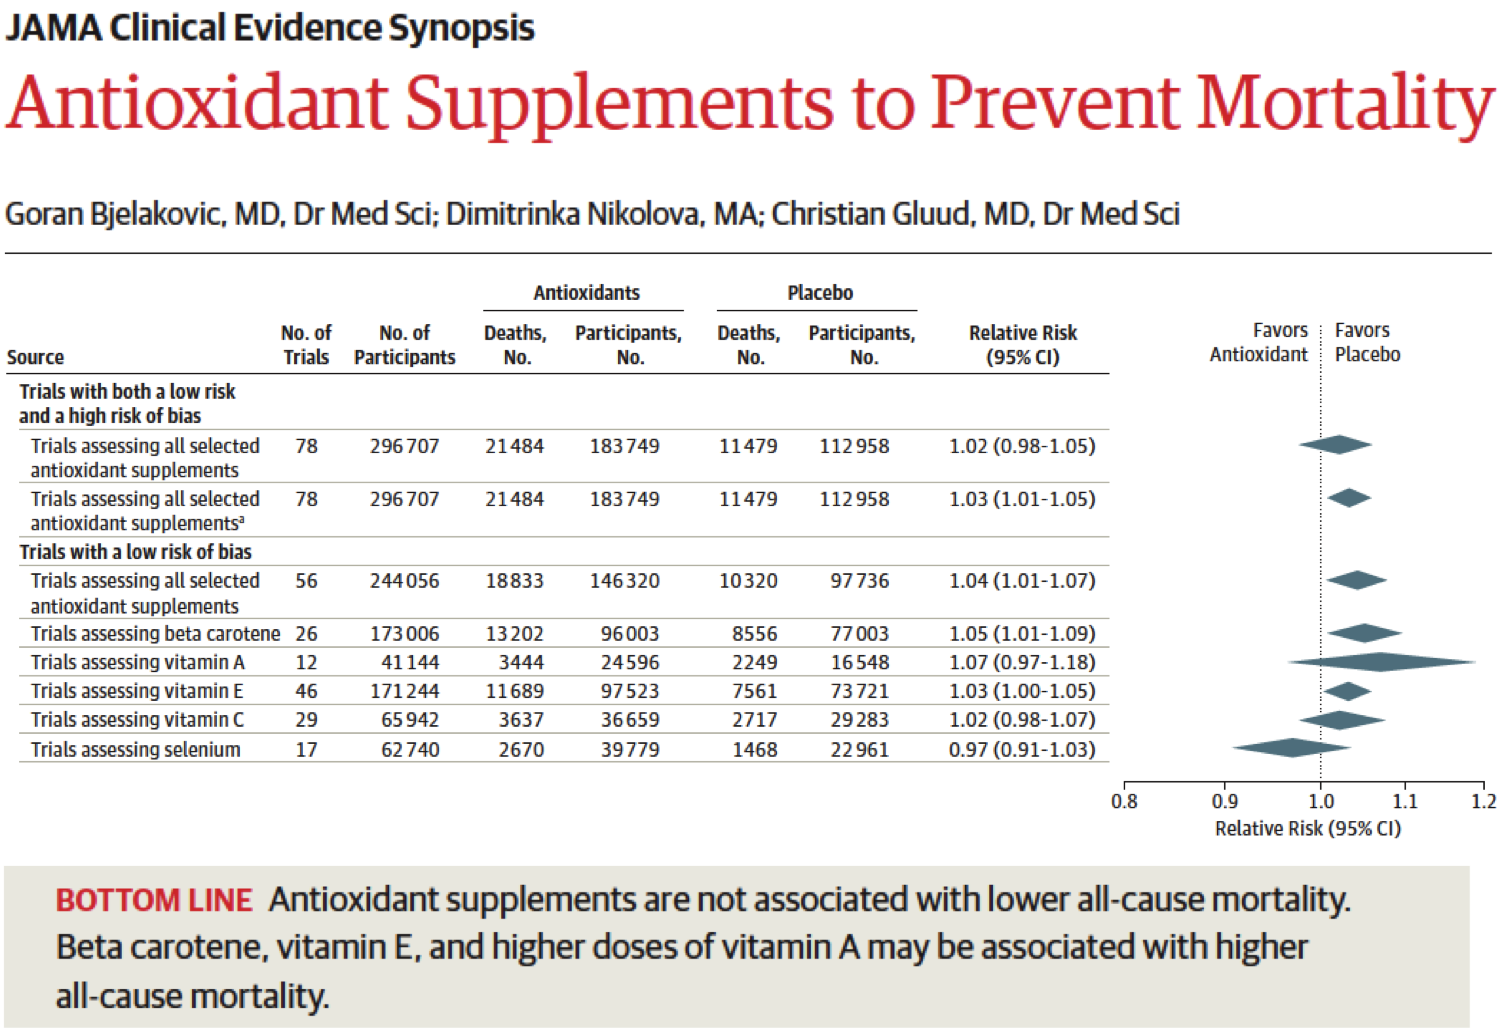 Antioxidant Use and Mortality